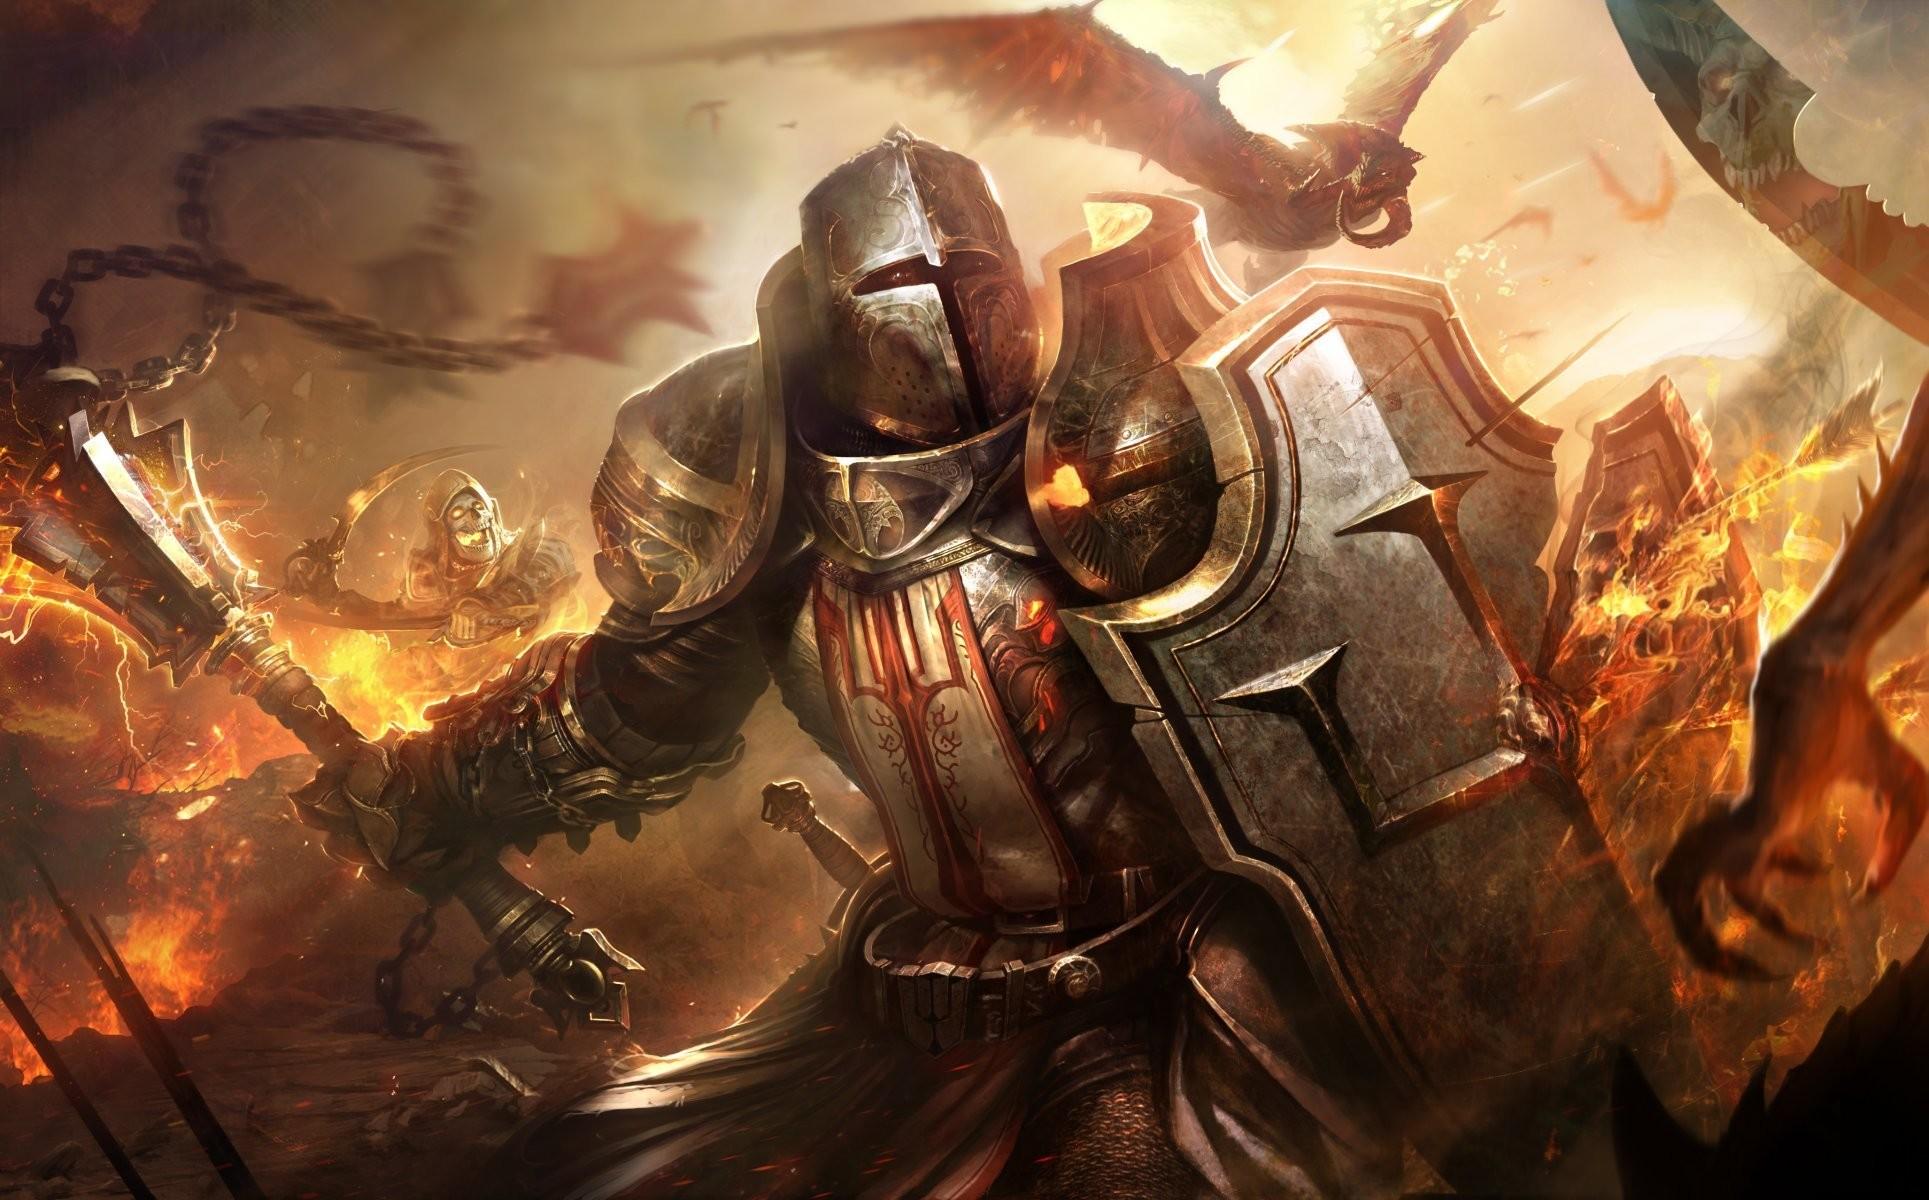 crusader diablo 3 warrior armour evil daemons crusader helmet